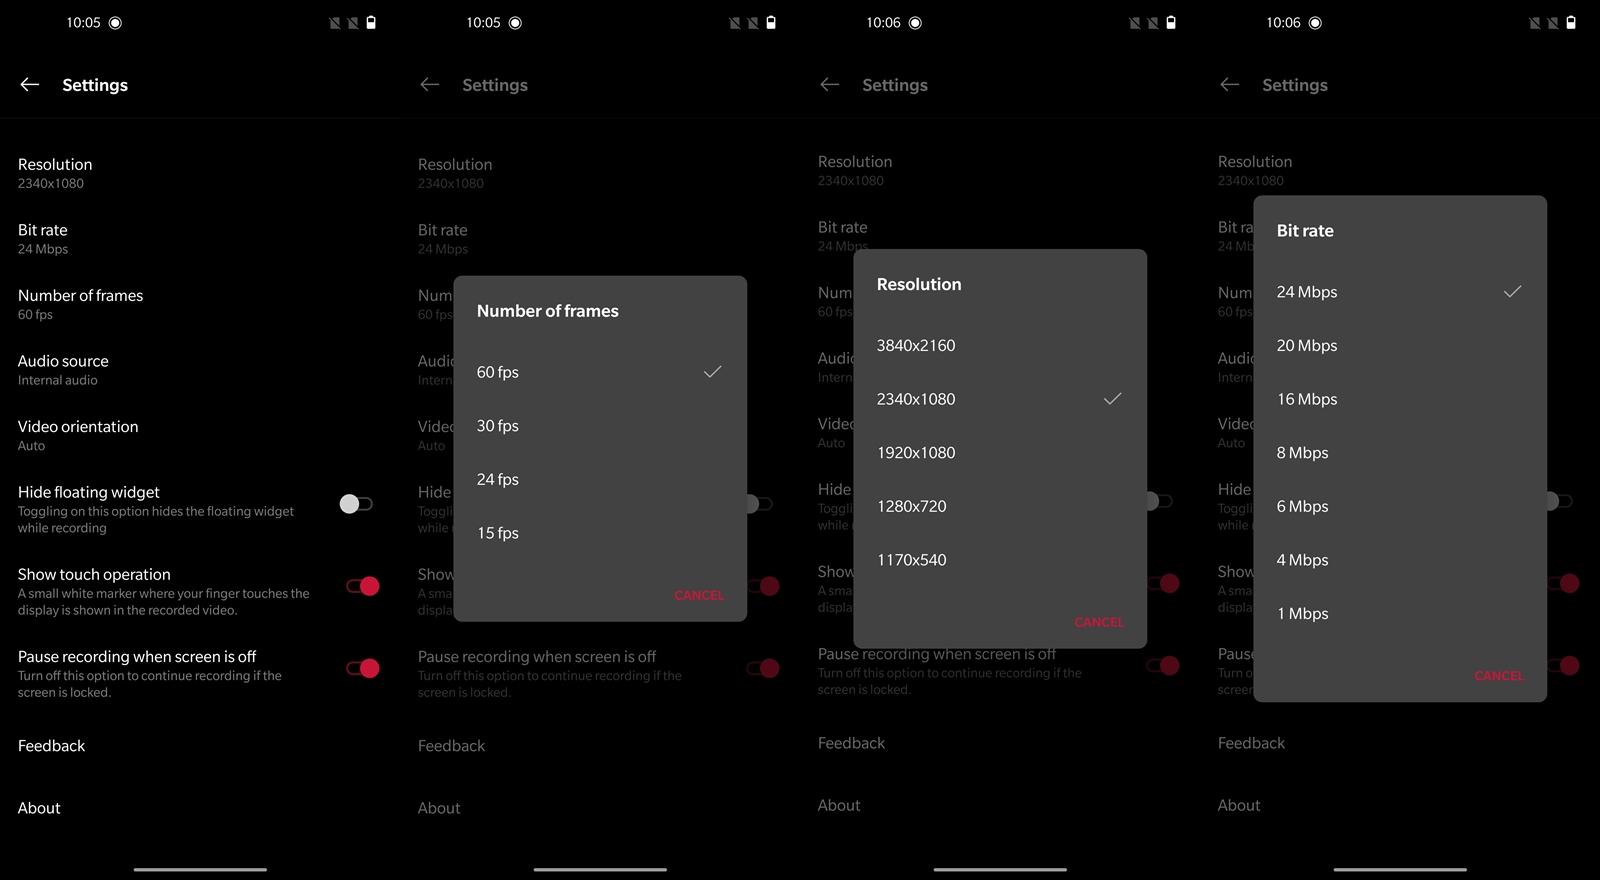 OnePlus 8 Pro Screen Record